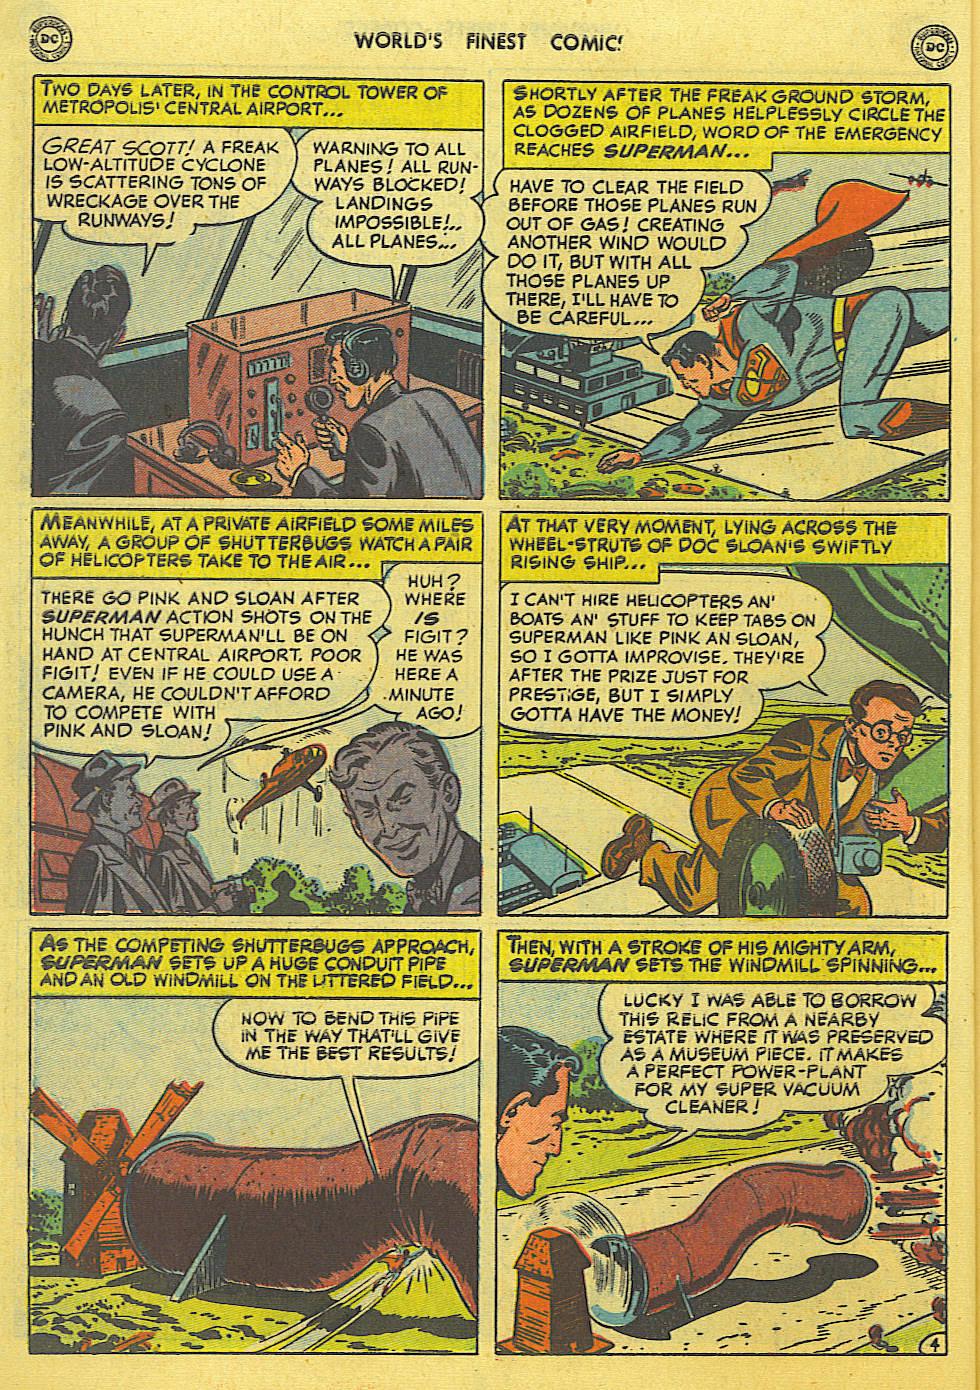 Read online World's Finest Comics comic -  Issue #49 - 6